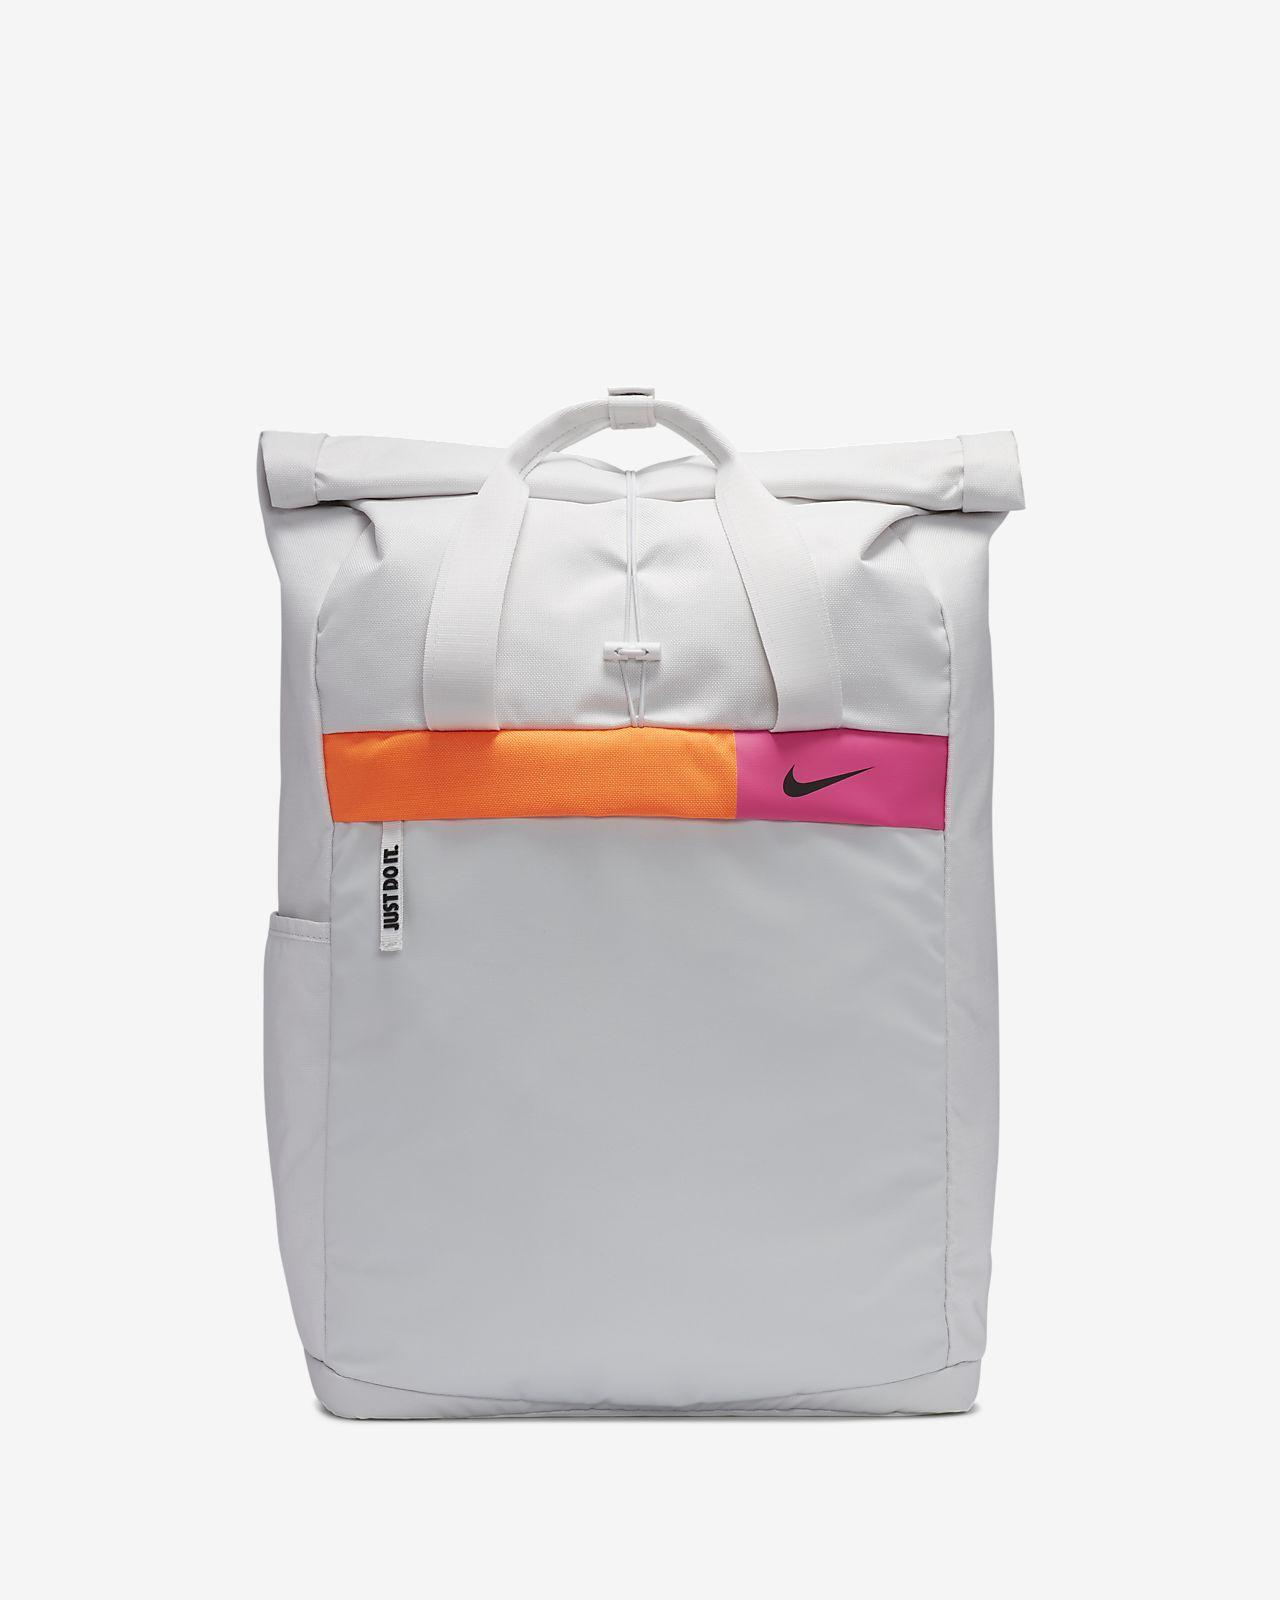 Nike Radiate Women's Graphic Training Backpack